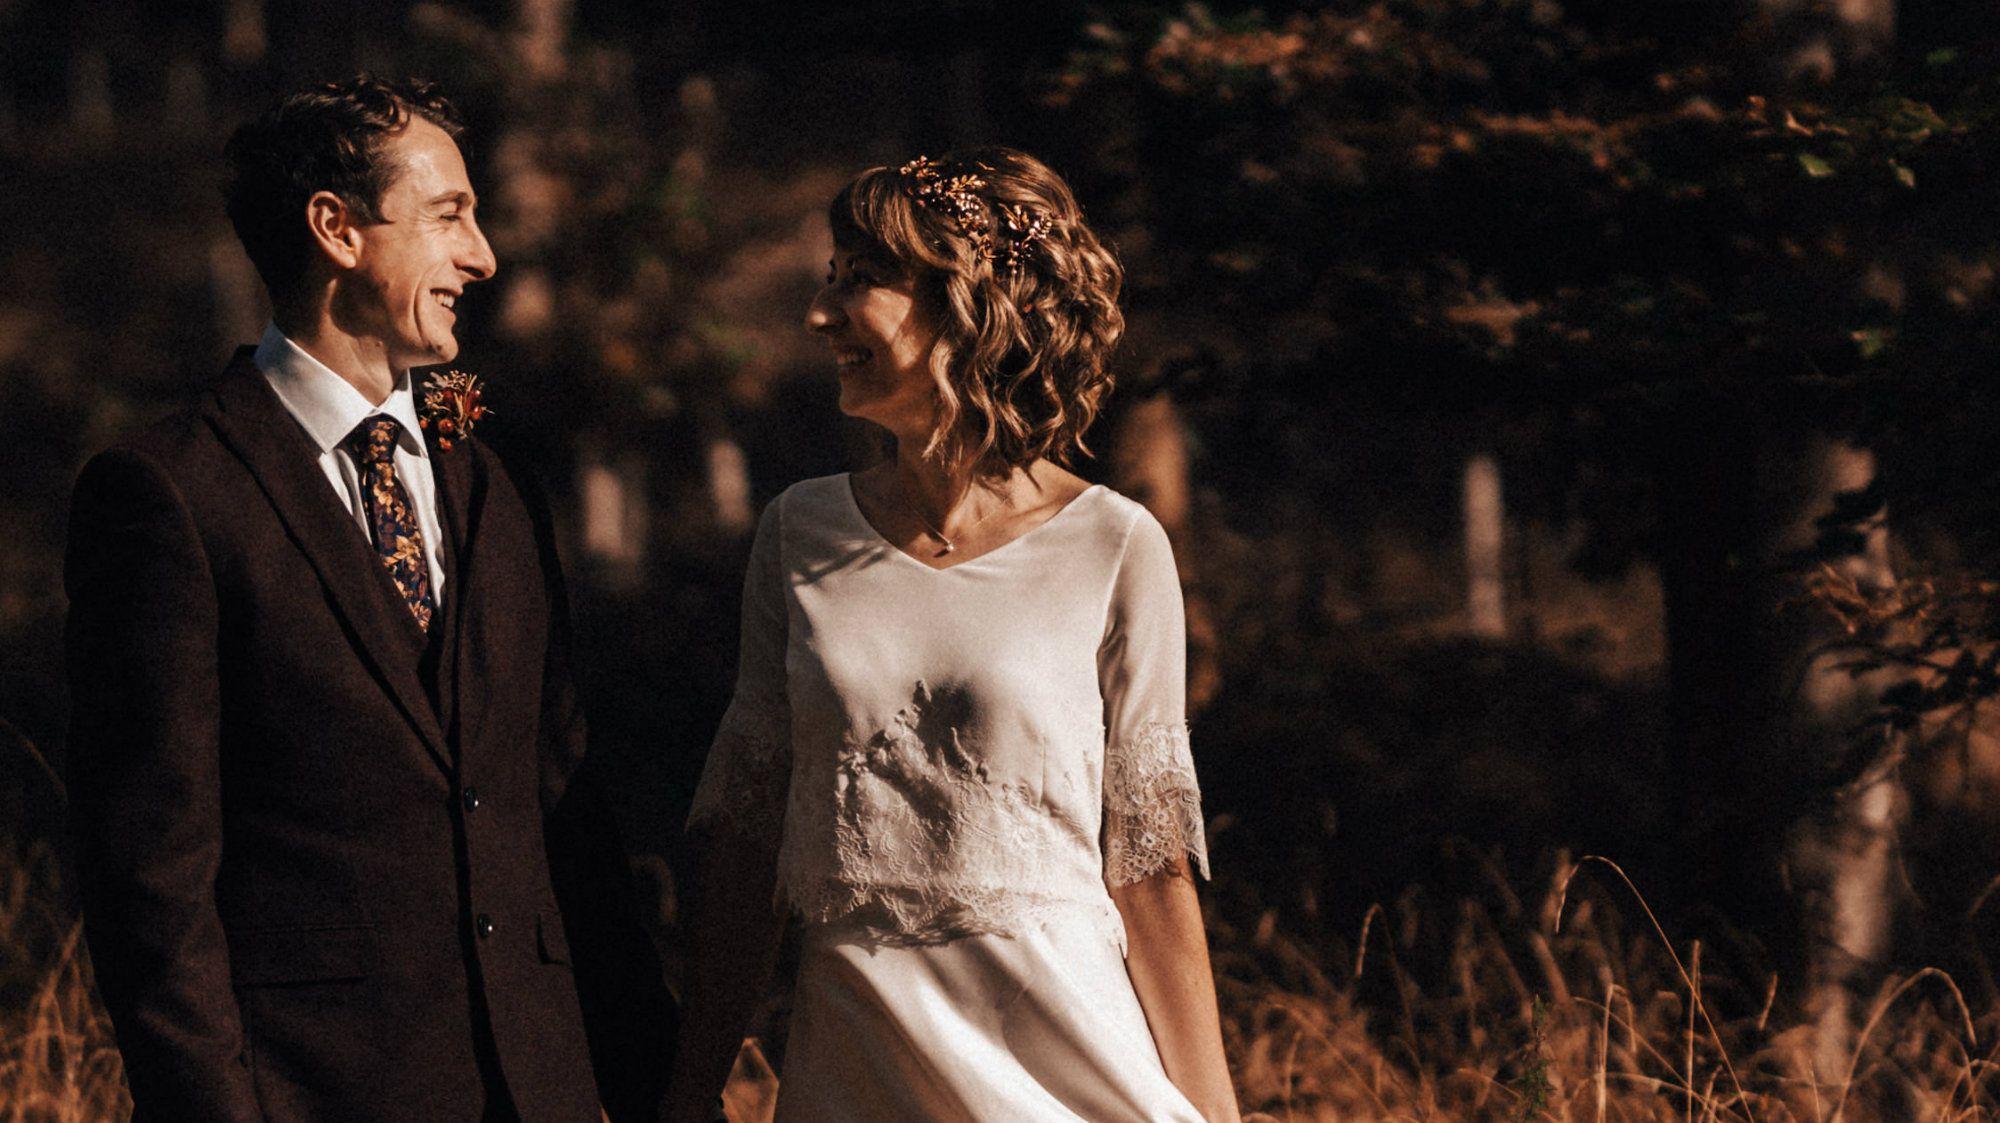 Bridal-wedding-occasion-hair-accessories-UK-gold-leaf-SRA-19